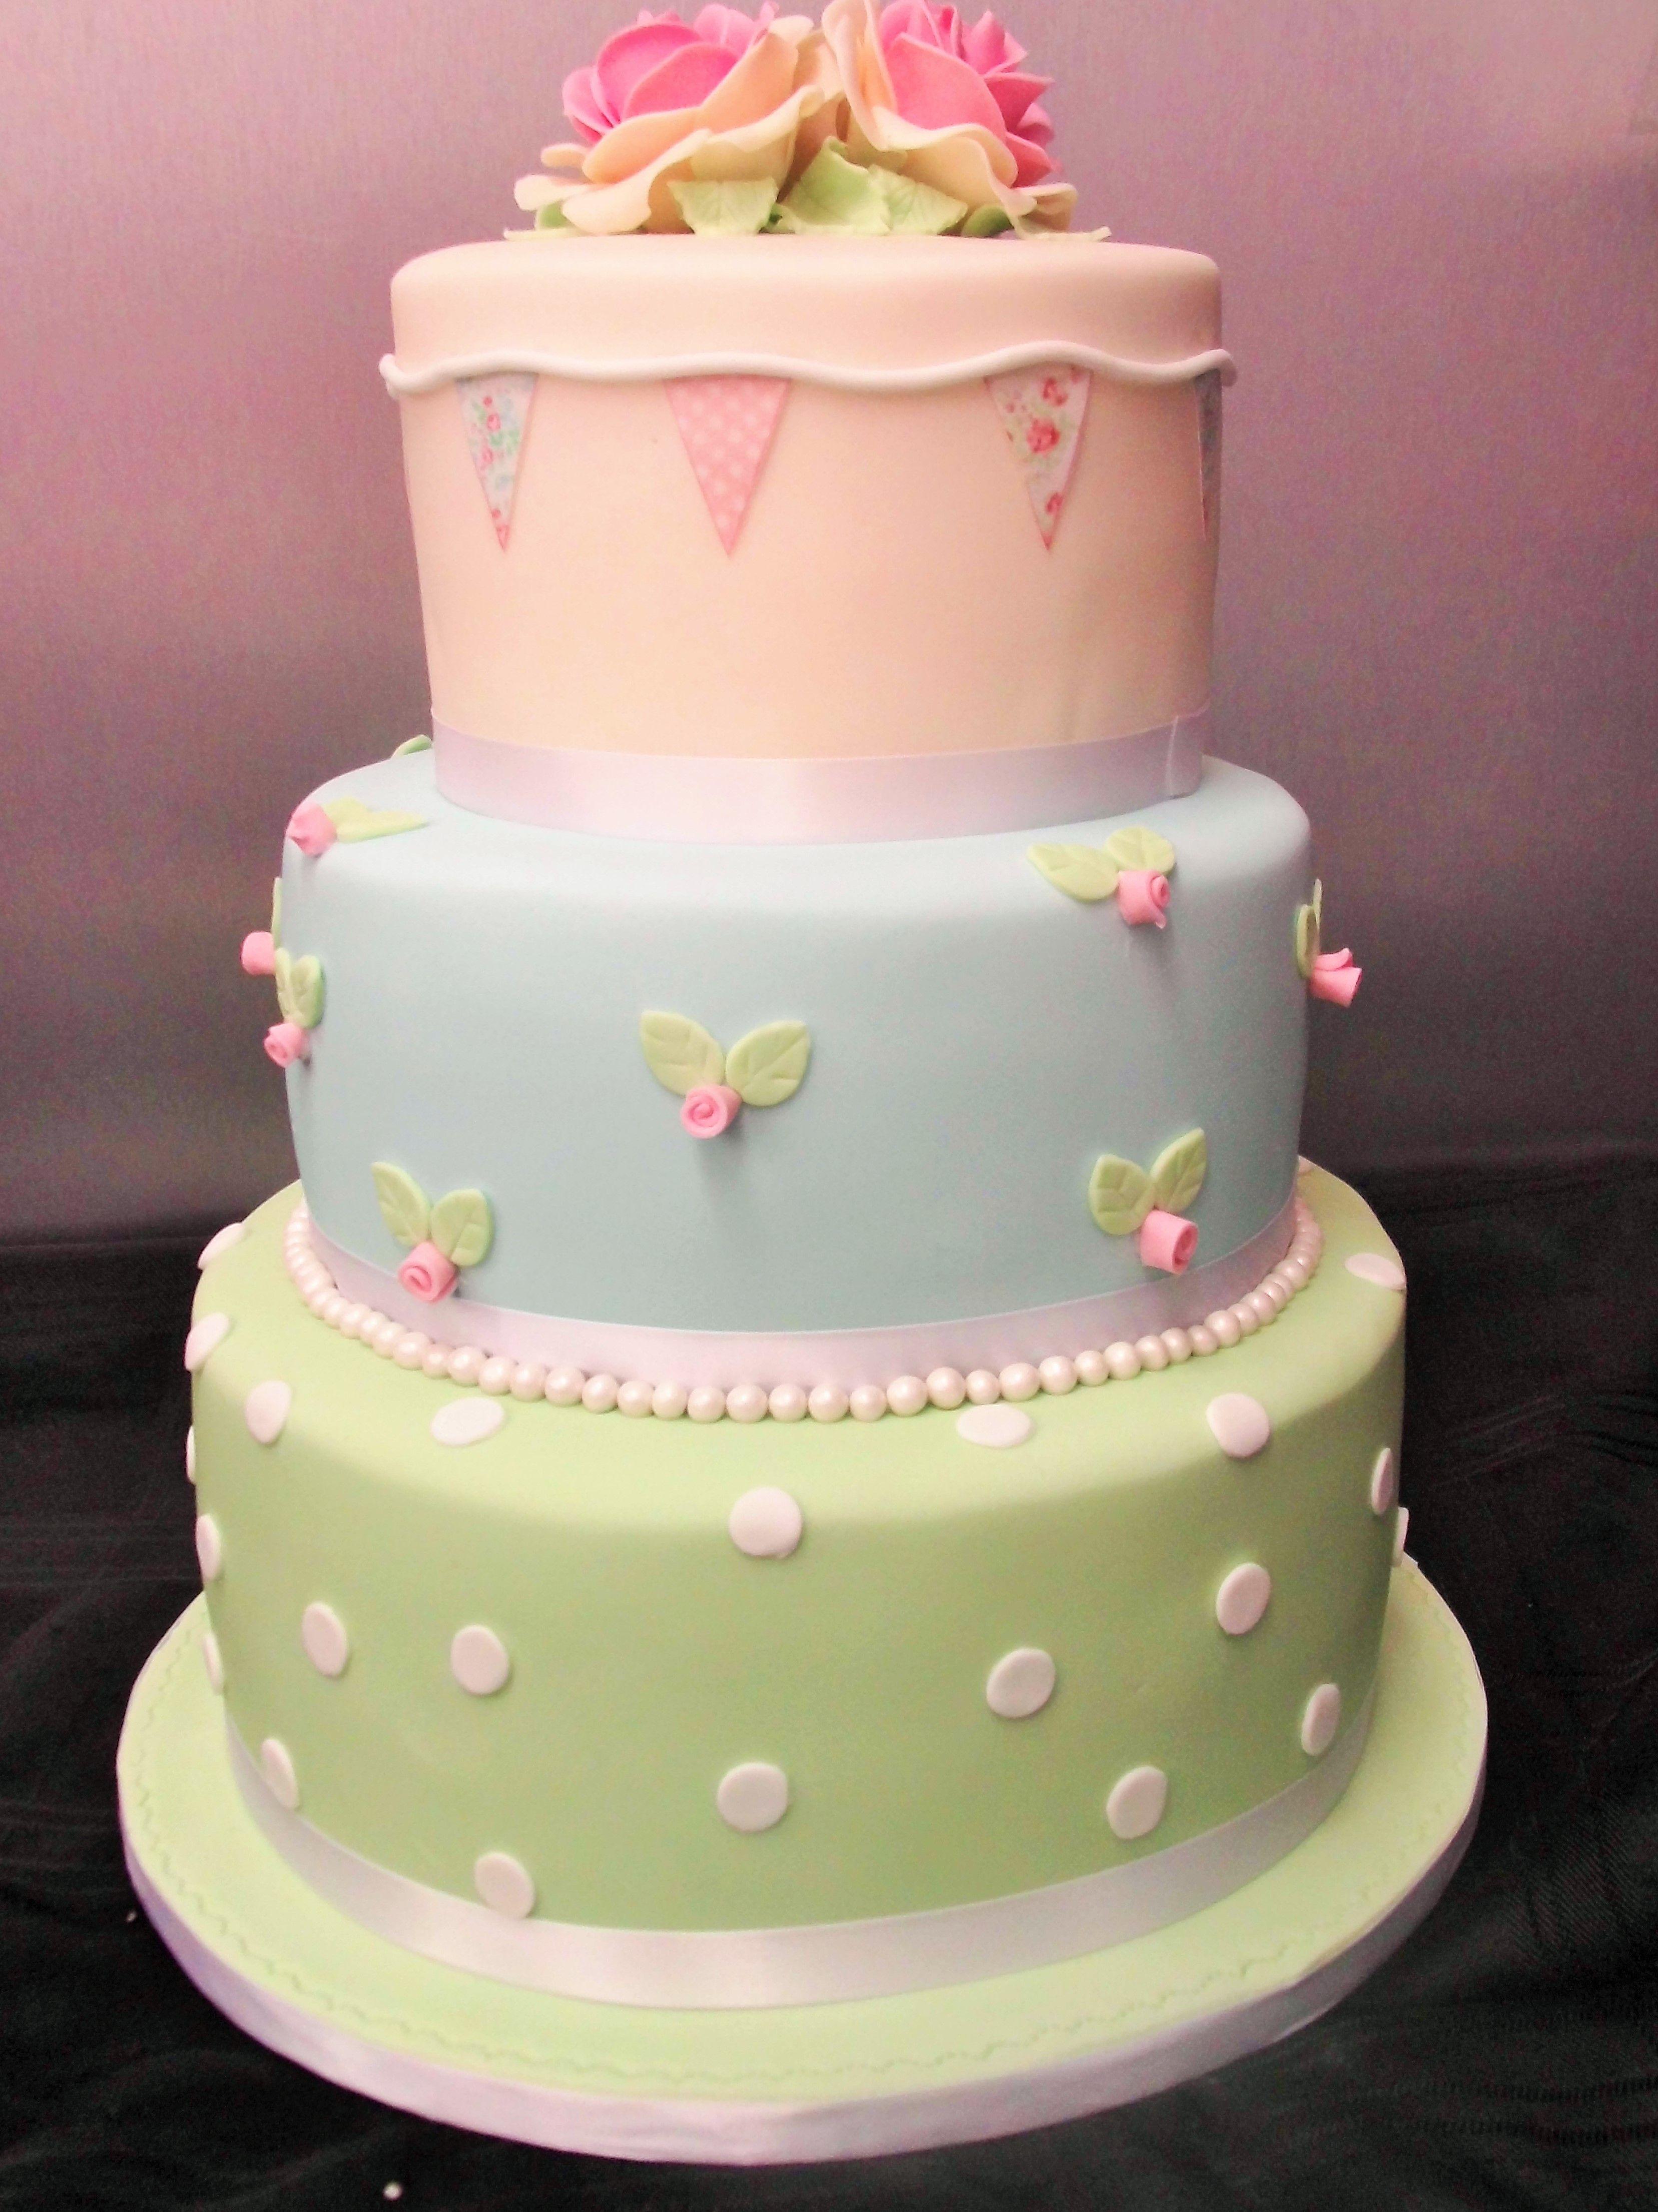 Vintage cath kidston inspired wedding cake